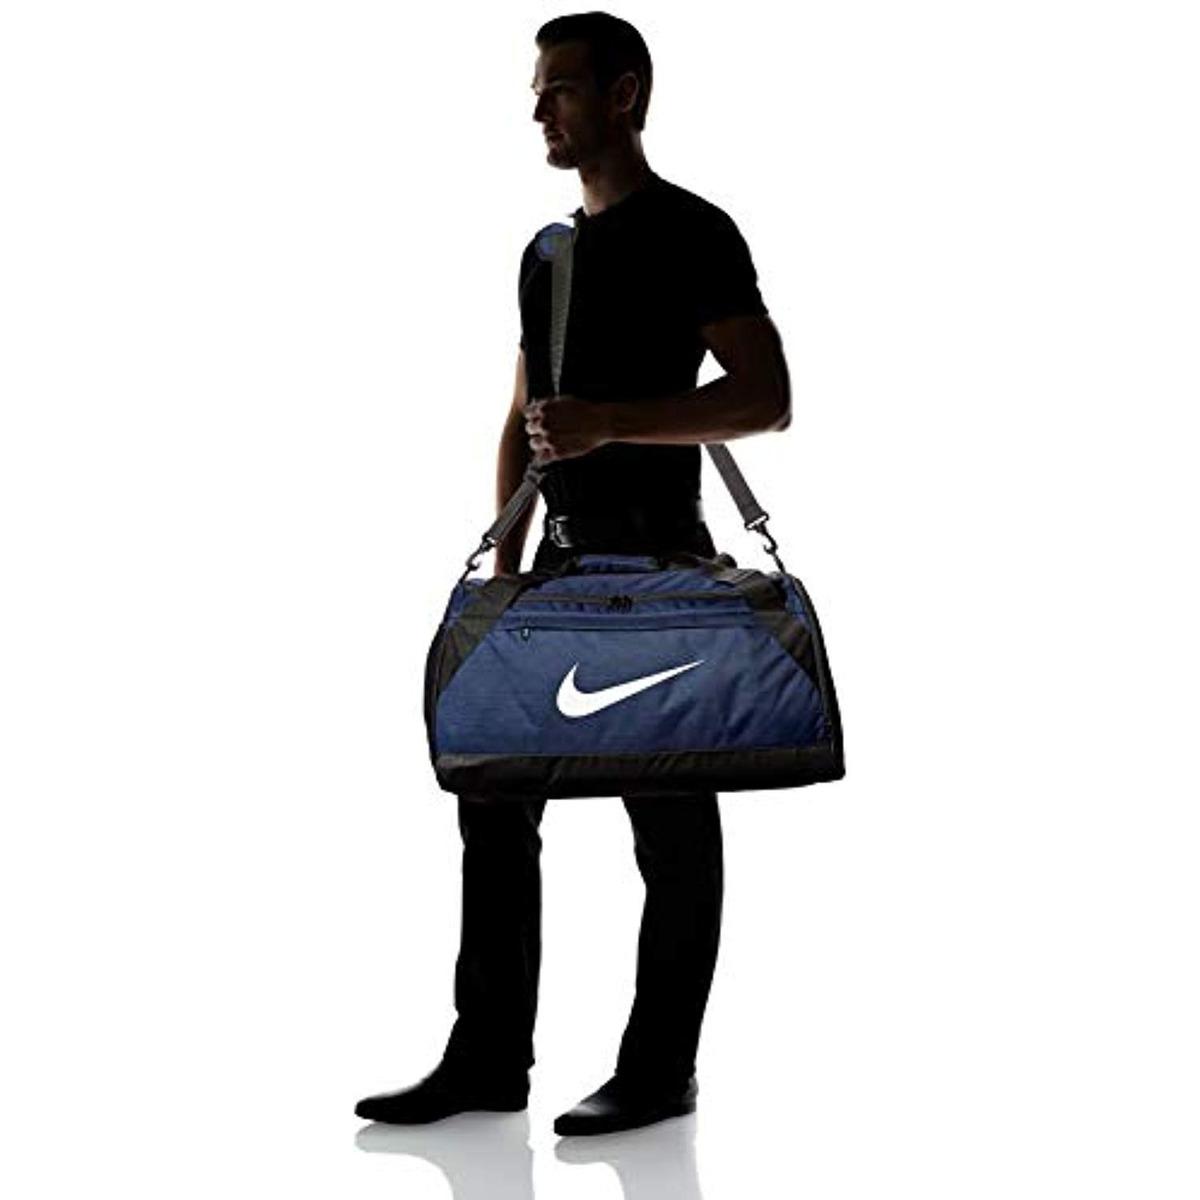 Nike Small Navy 6 X Bolsa Midnight Brasilia Duffel 3AL5Rj4